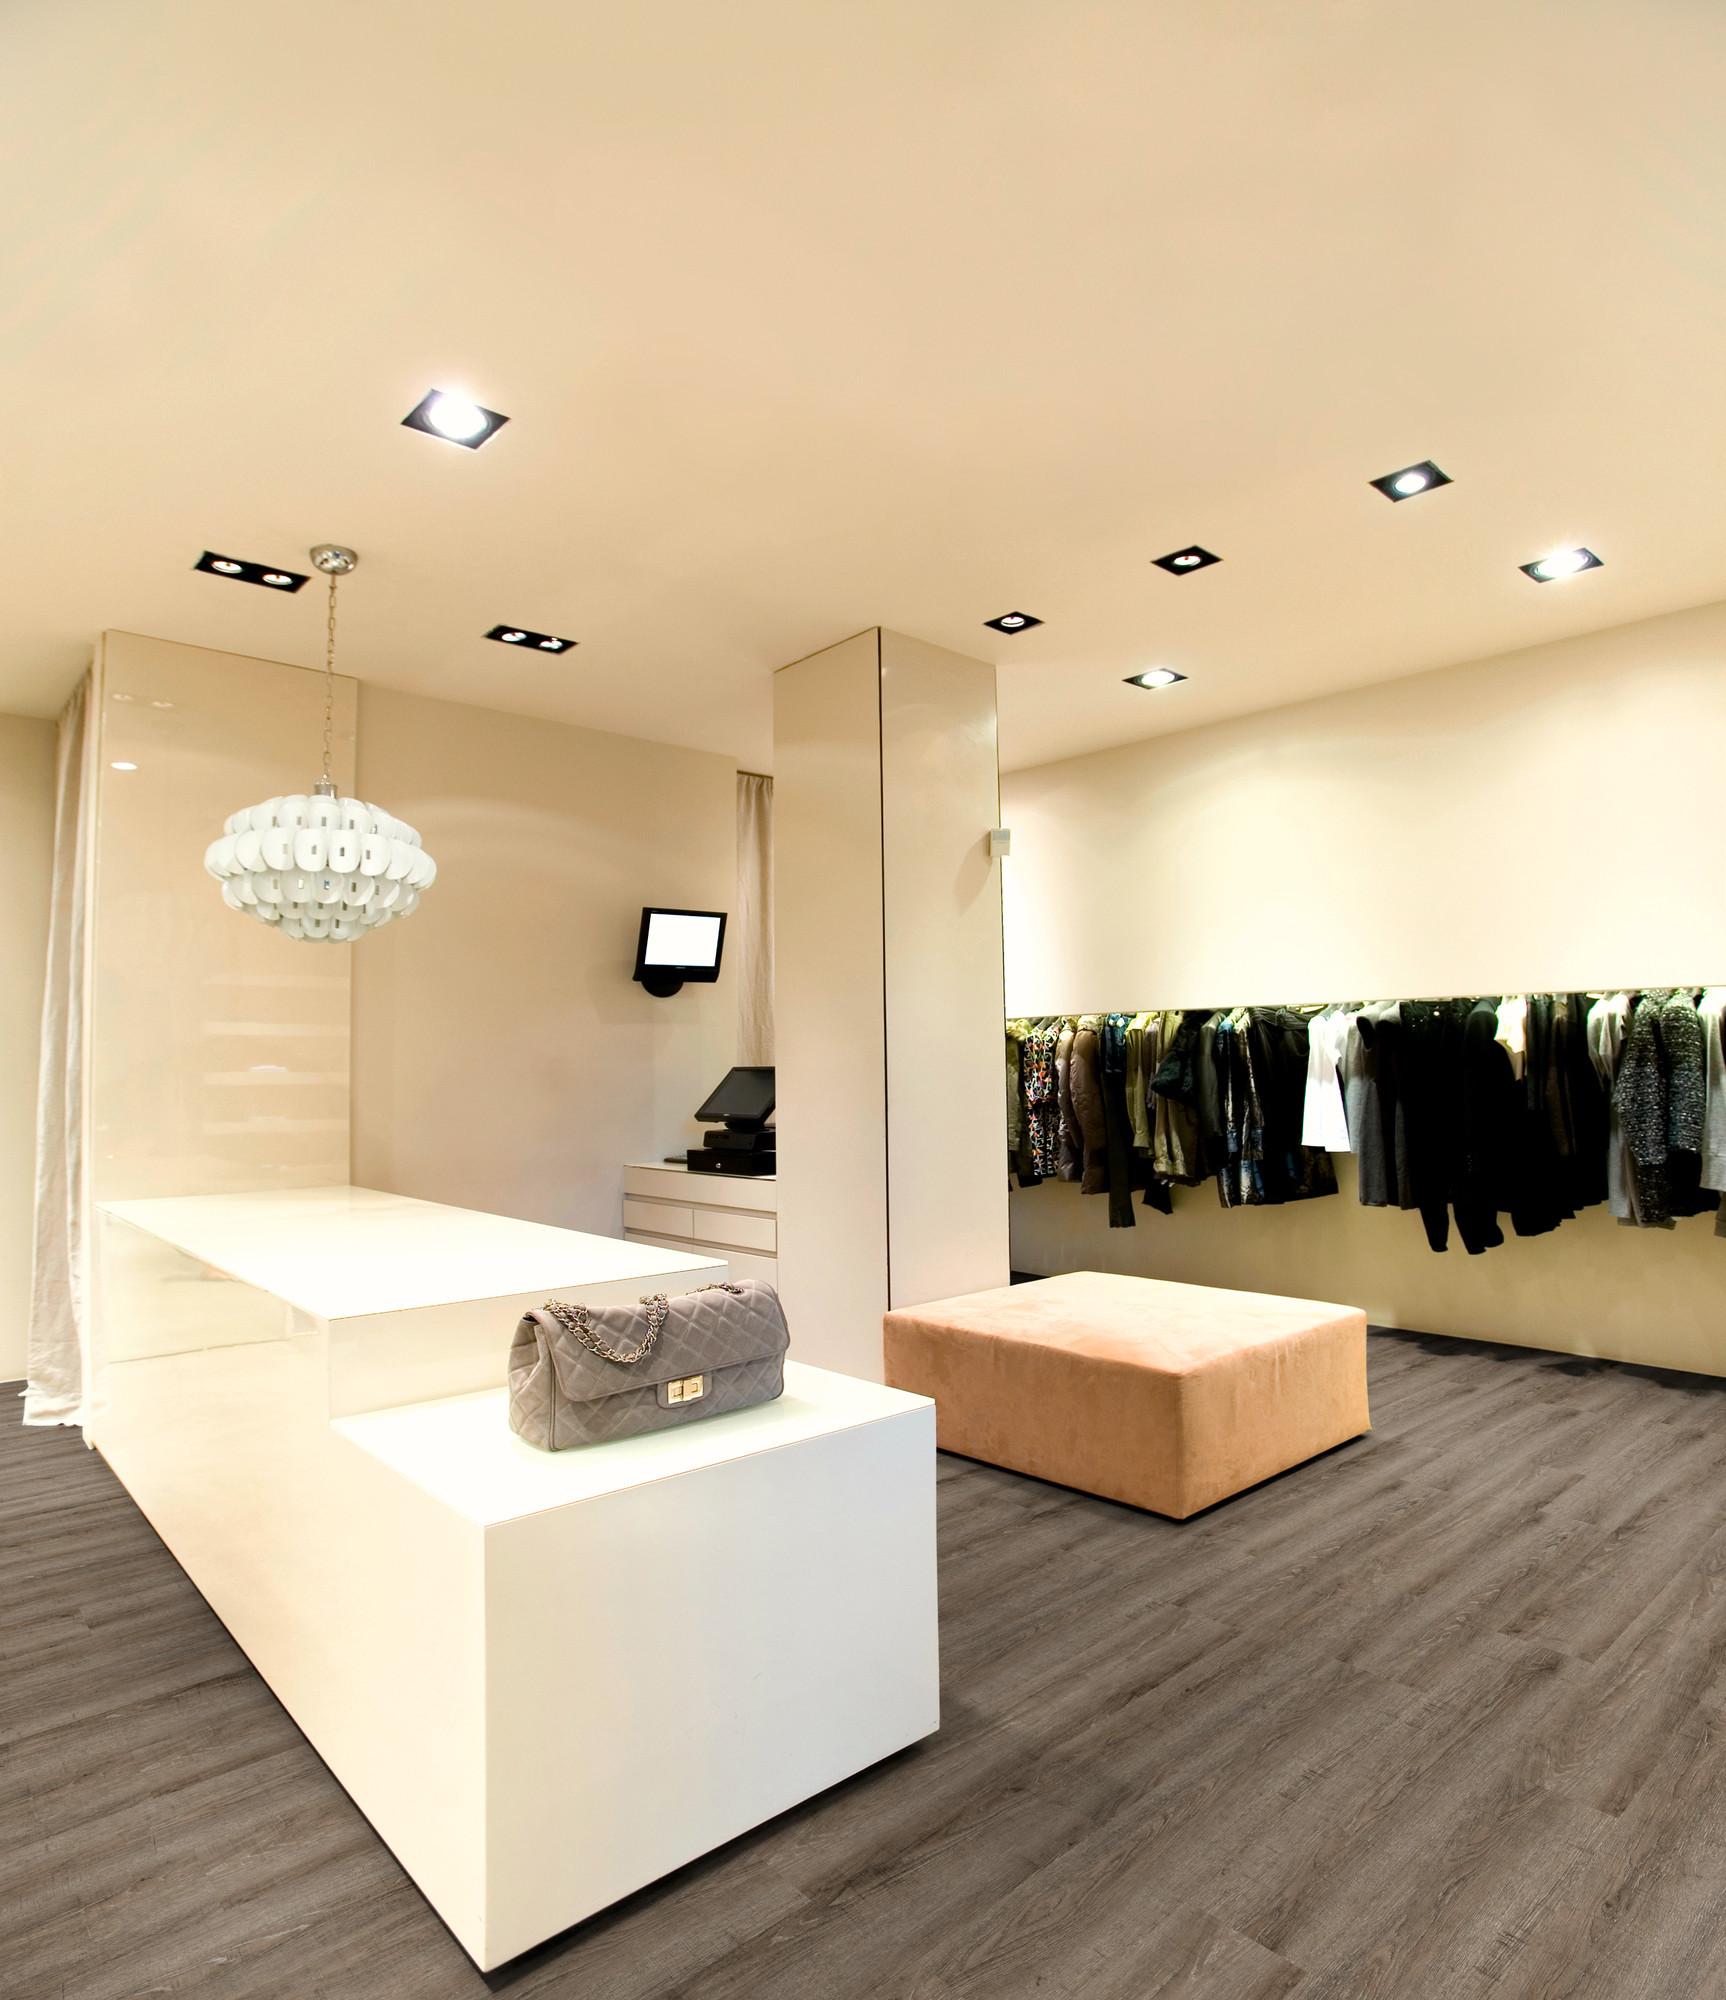 Raumbild - Designboden - Contract 0,55 Planke Click 2